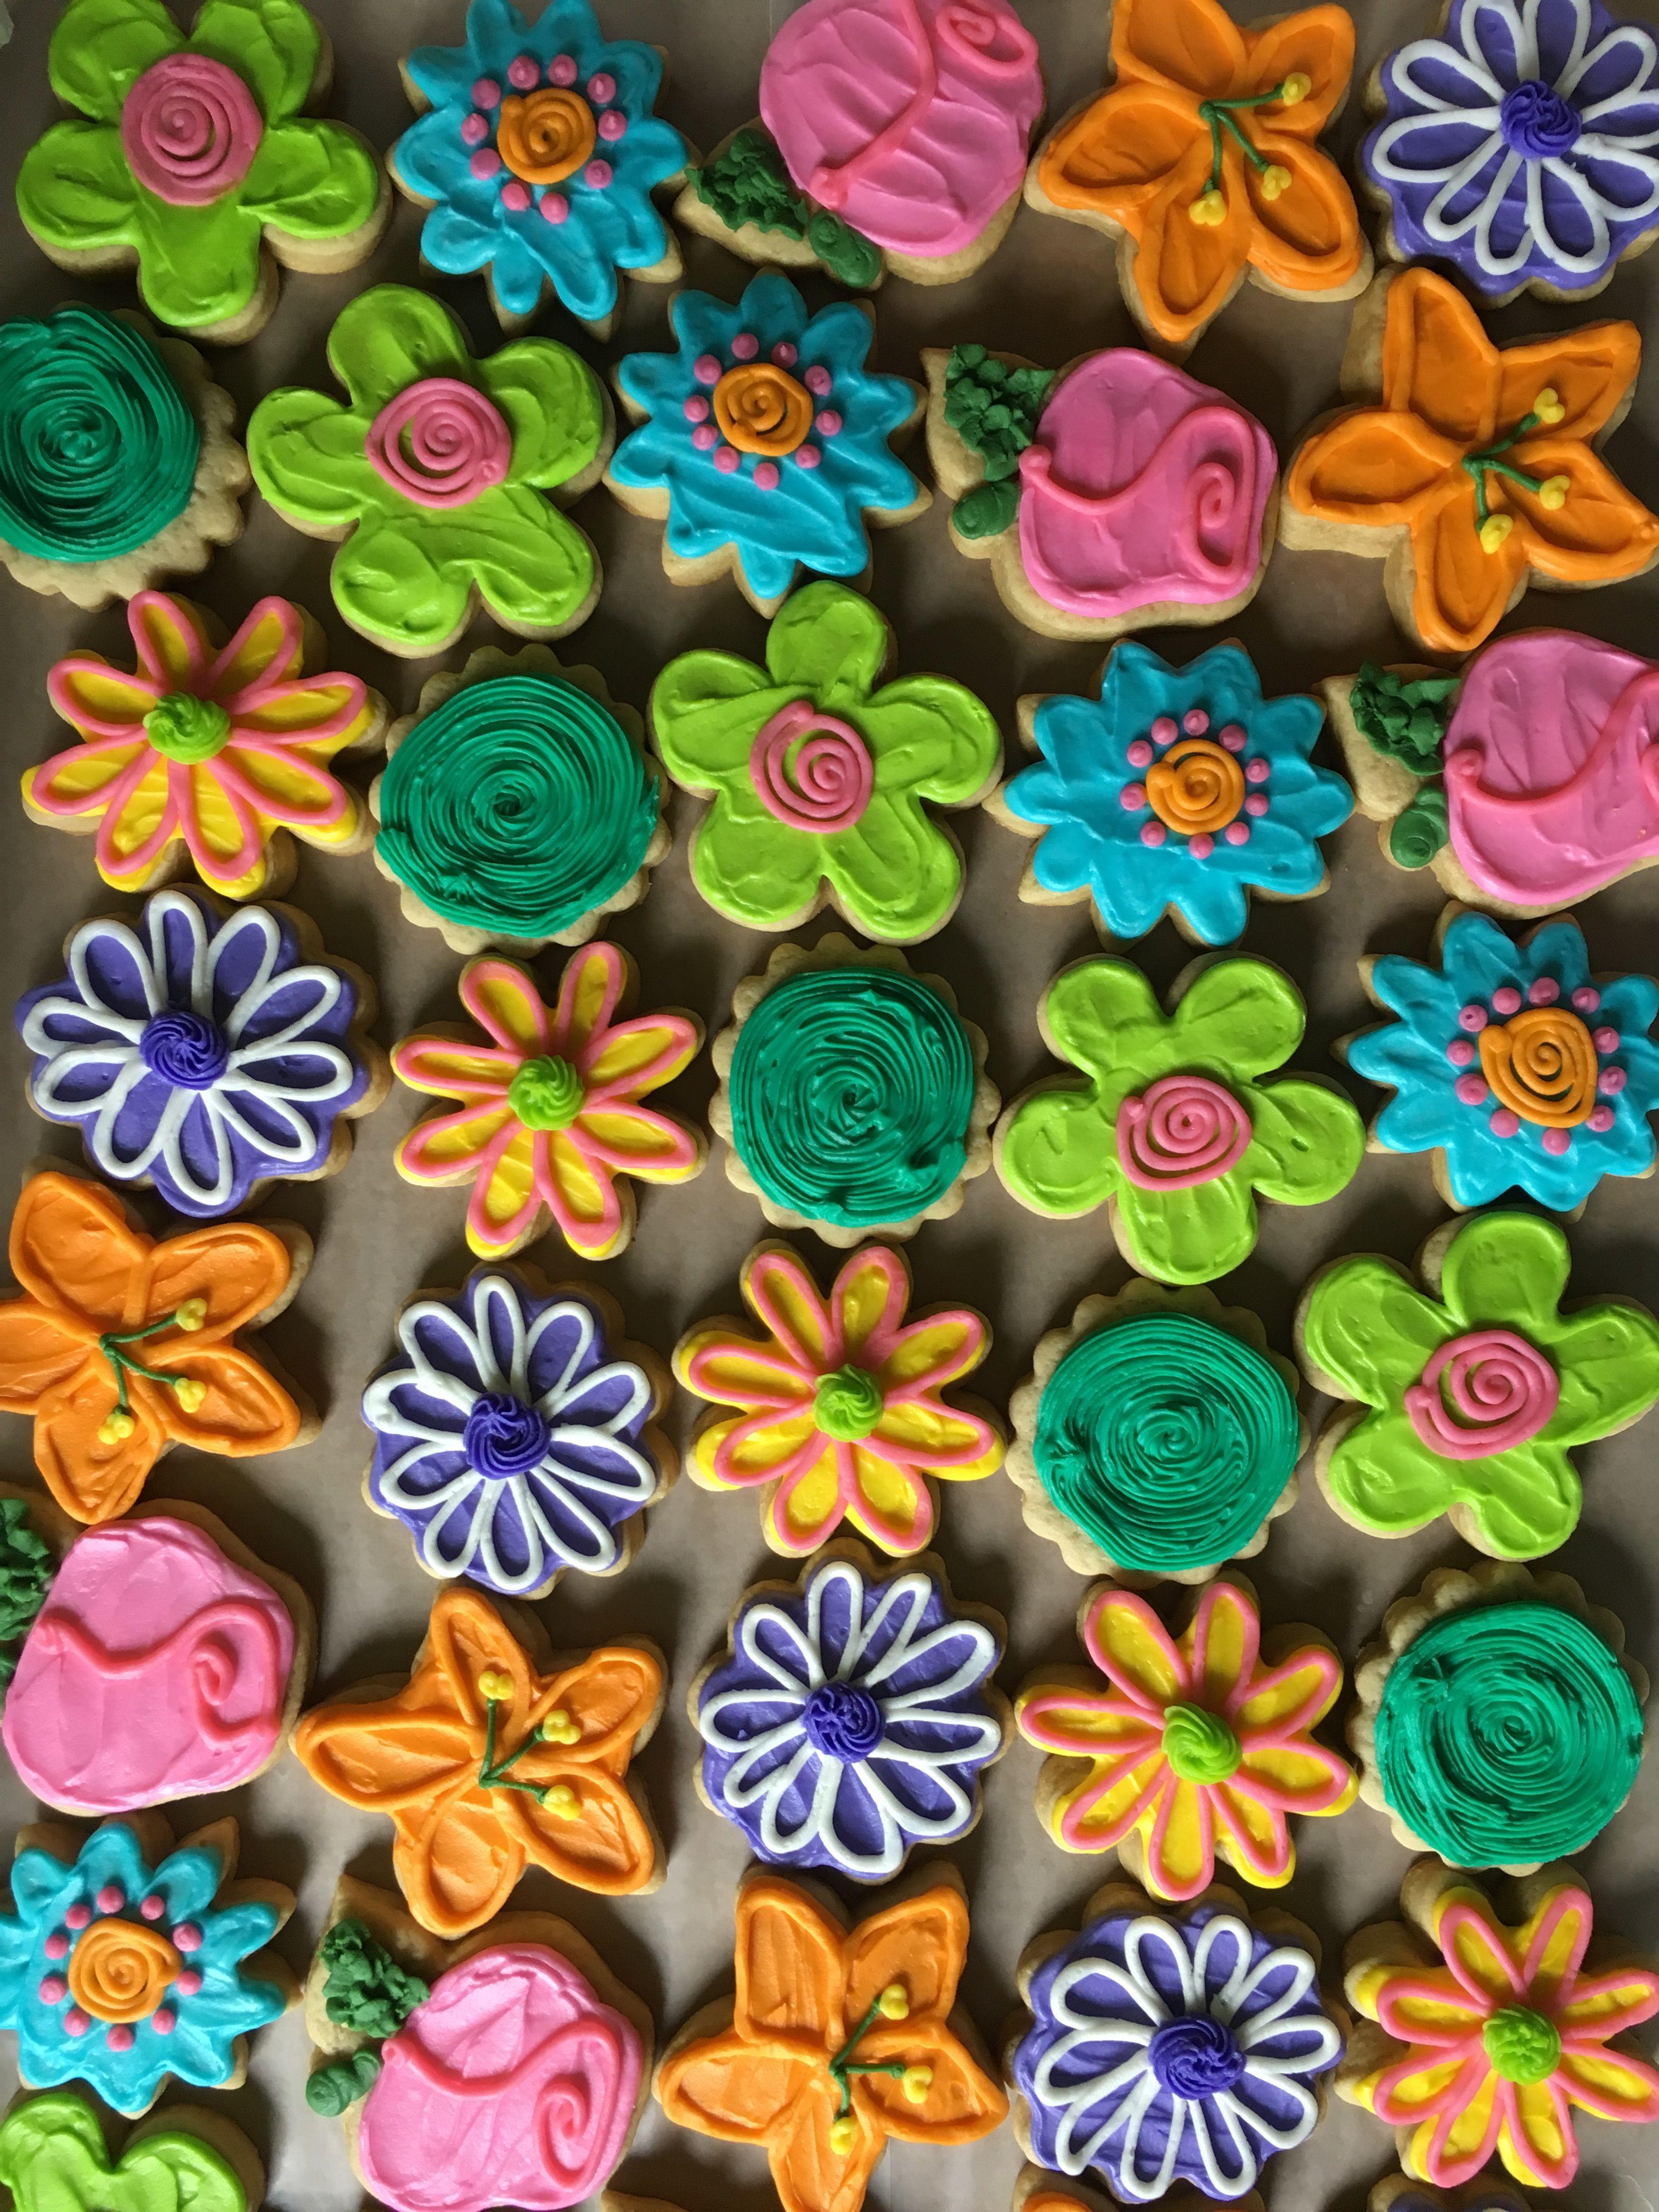 lego flower bouquet 10280 review